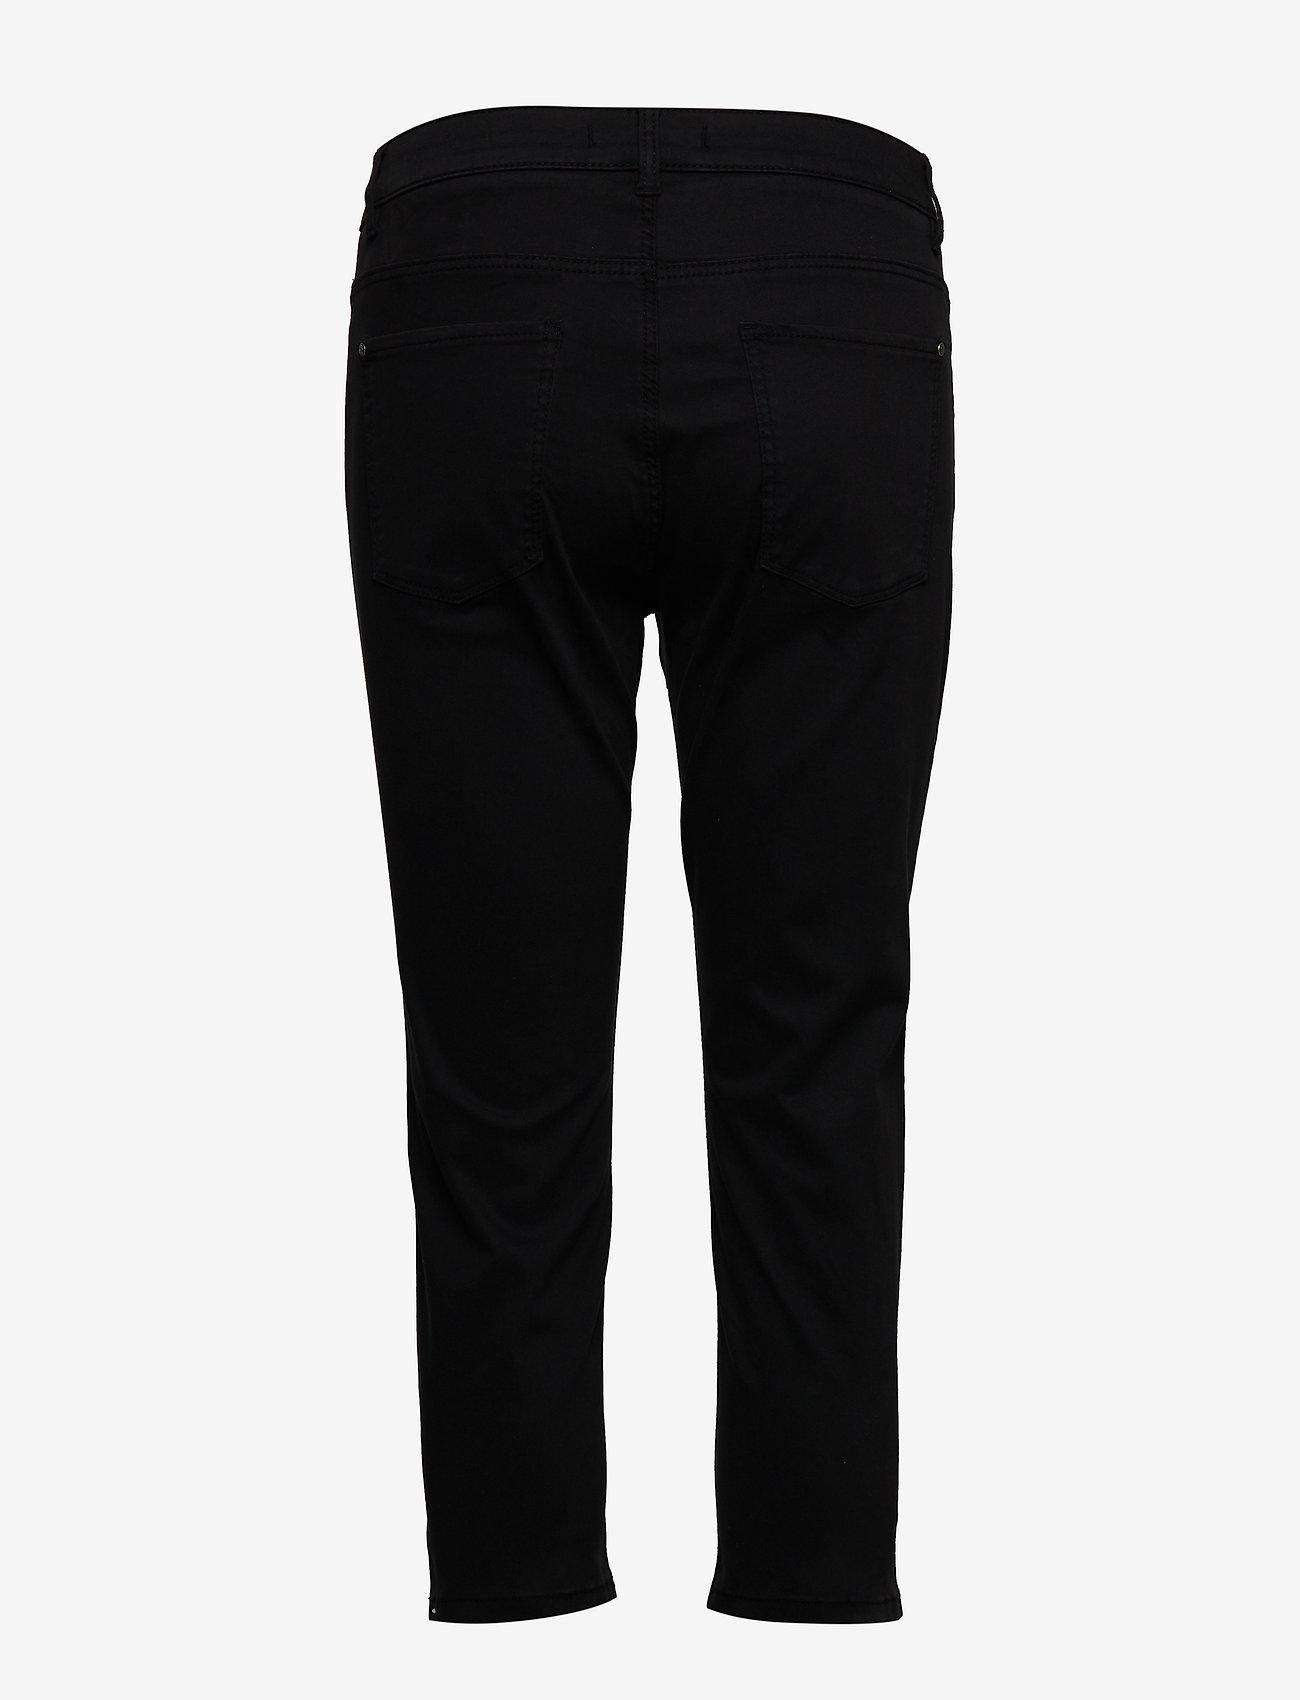 Esprit Casual - Pants woven - casual bukser - black - 1